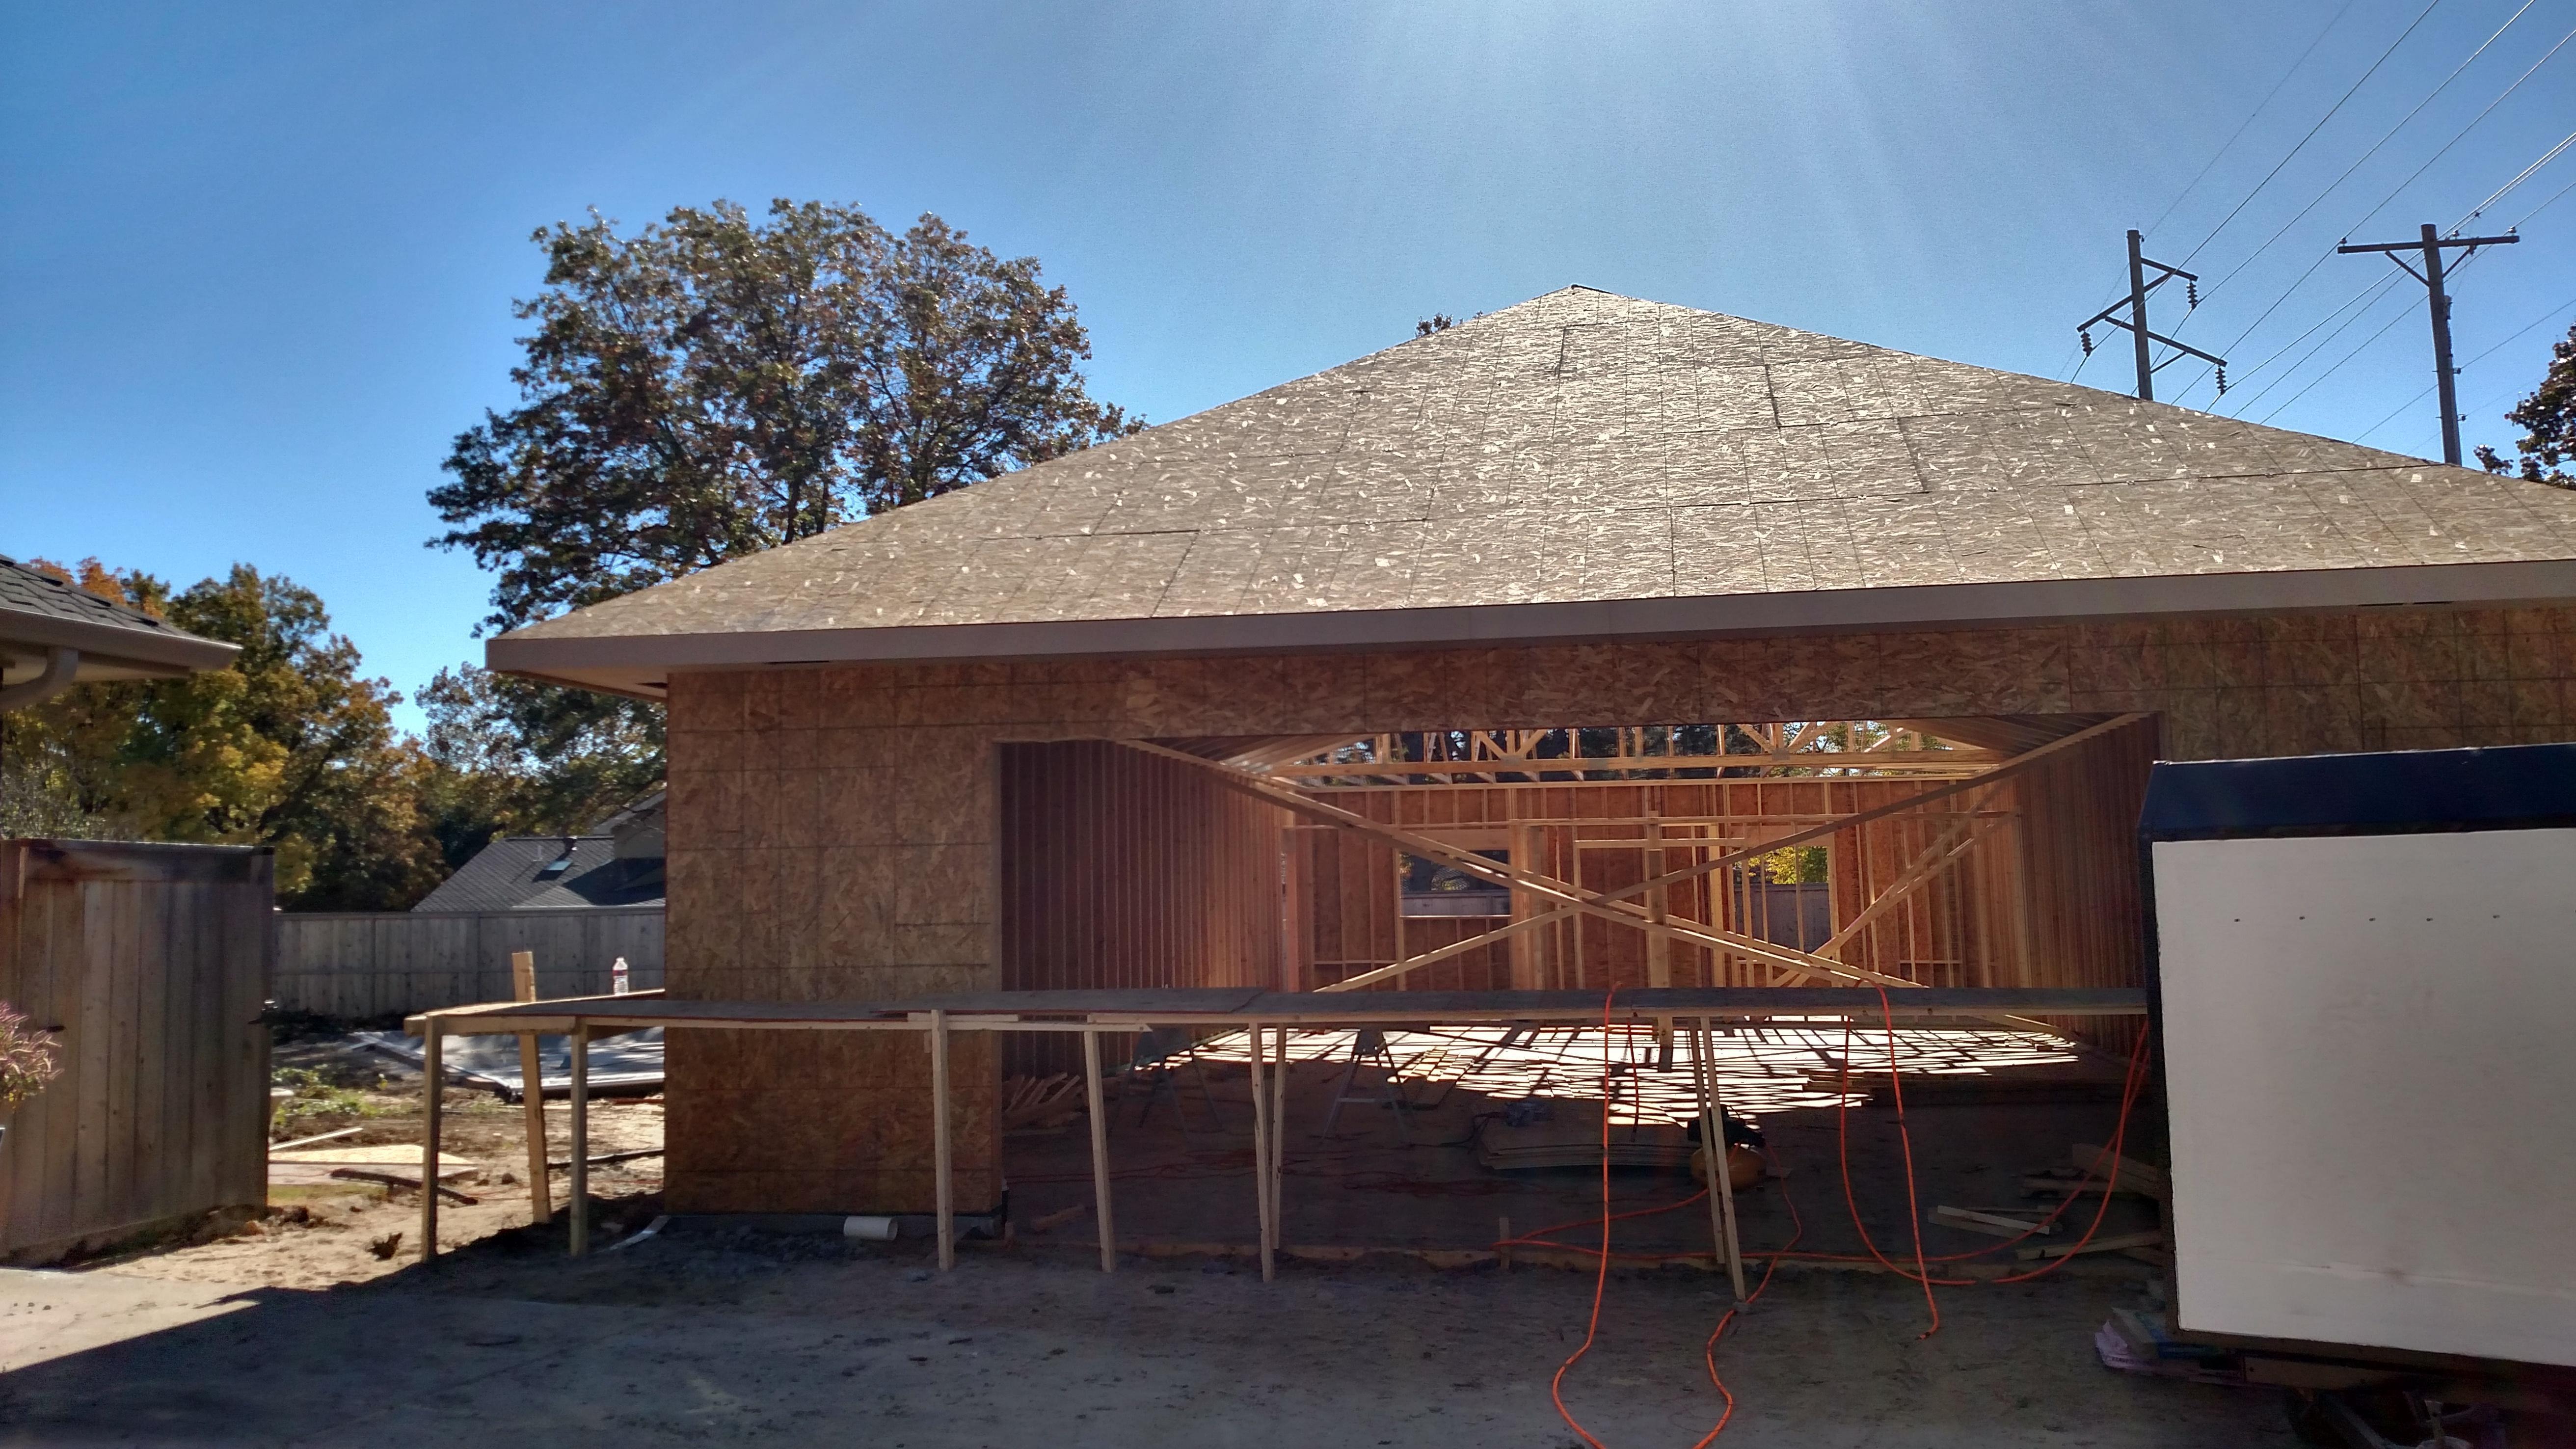 32 Model Star Lumber Wichita Wallpaper Cool Hd